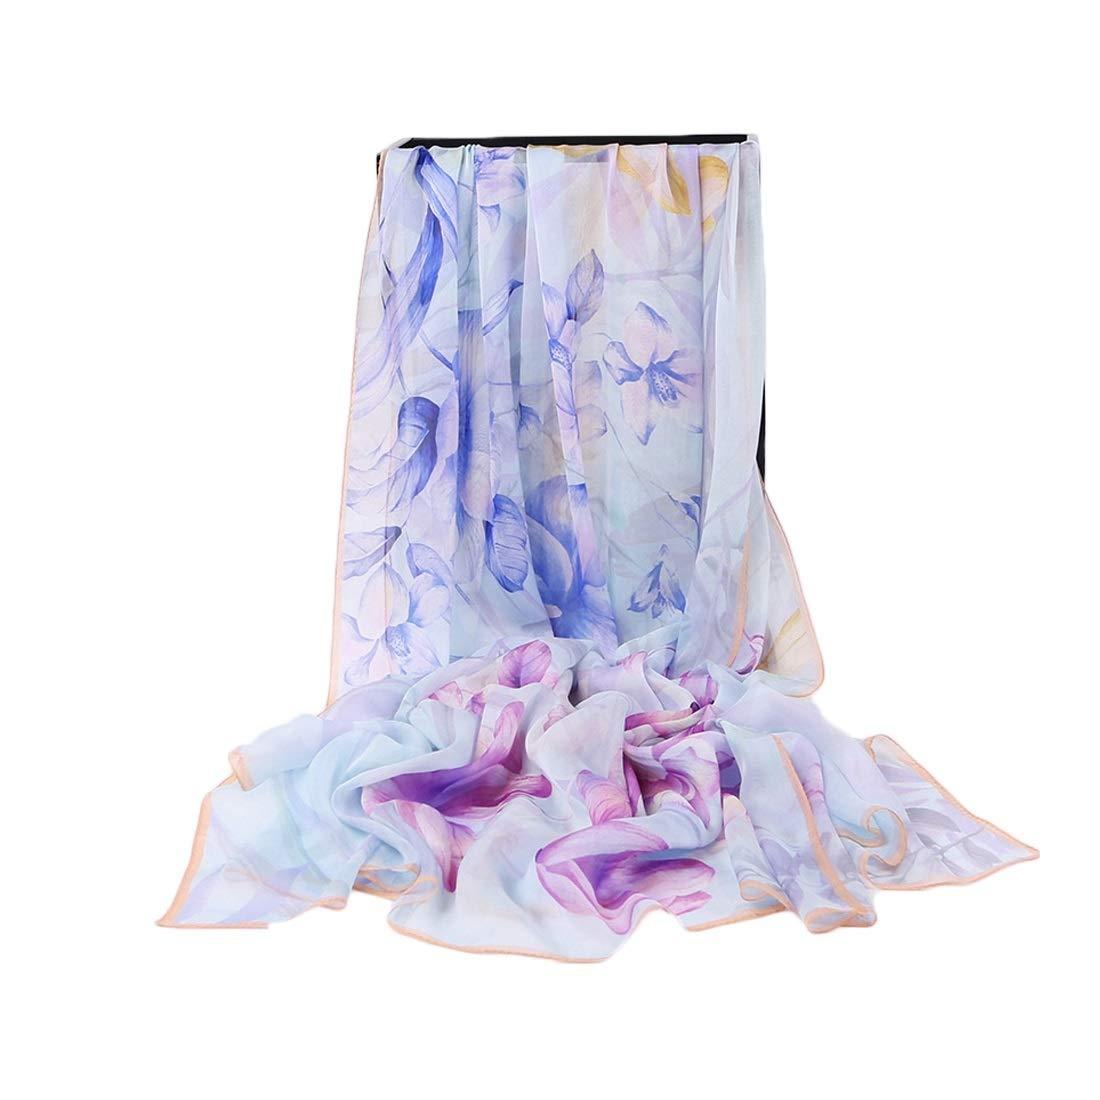 2 YUKILO Women's Scarves Comfortable Travel Beach Towel Light Scarf for Women (color   3, Size   195x106CM)